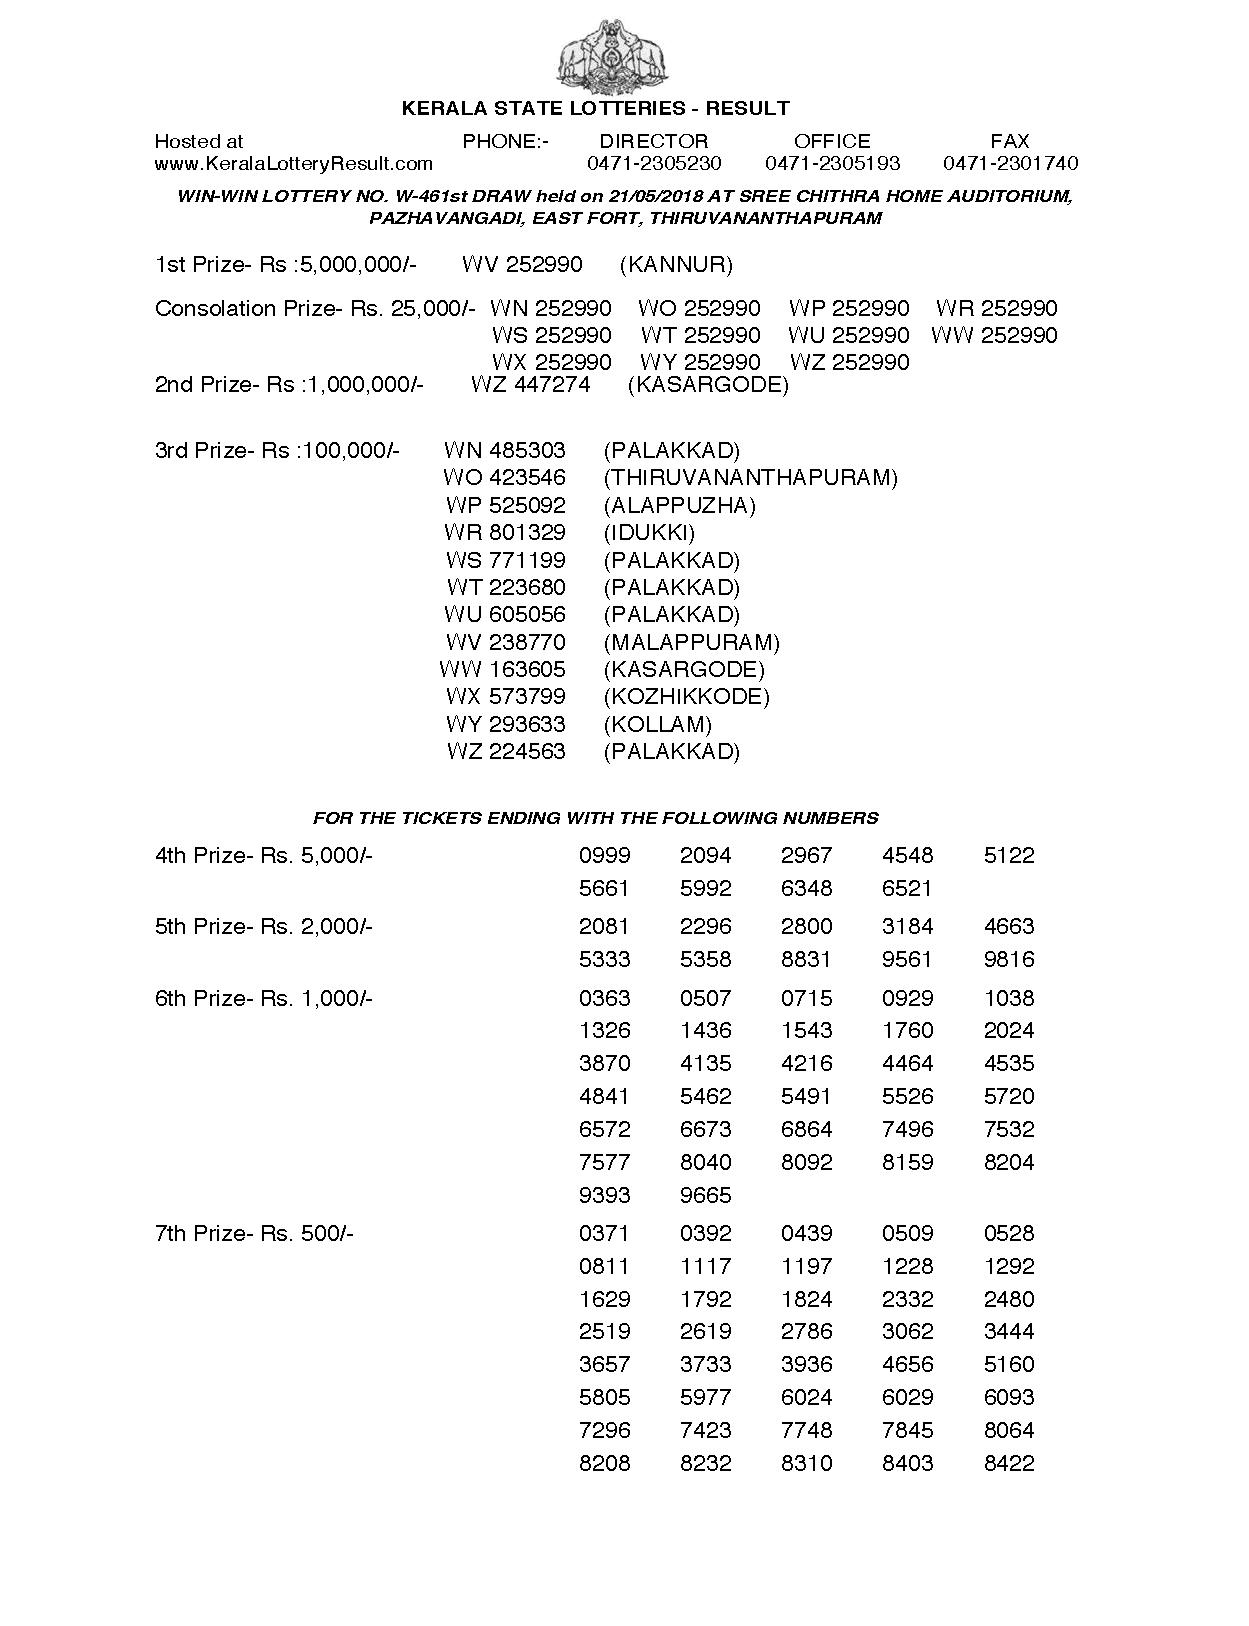 Winwin W461 Kerala Lottery Results Screenshot: Page 1